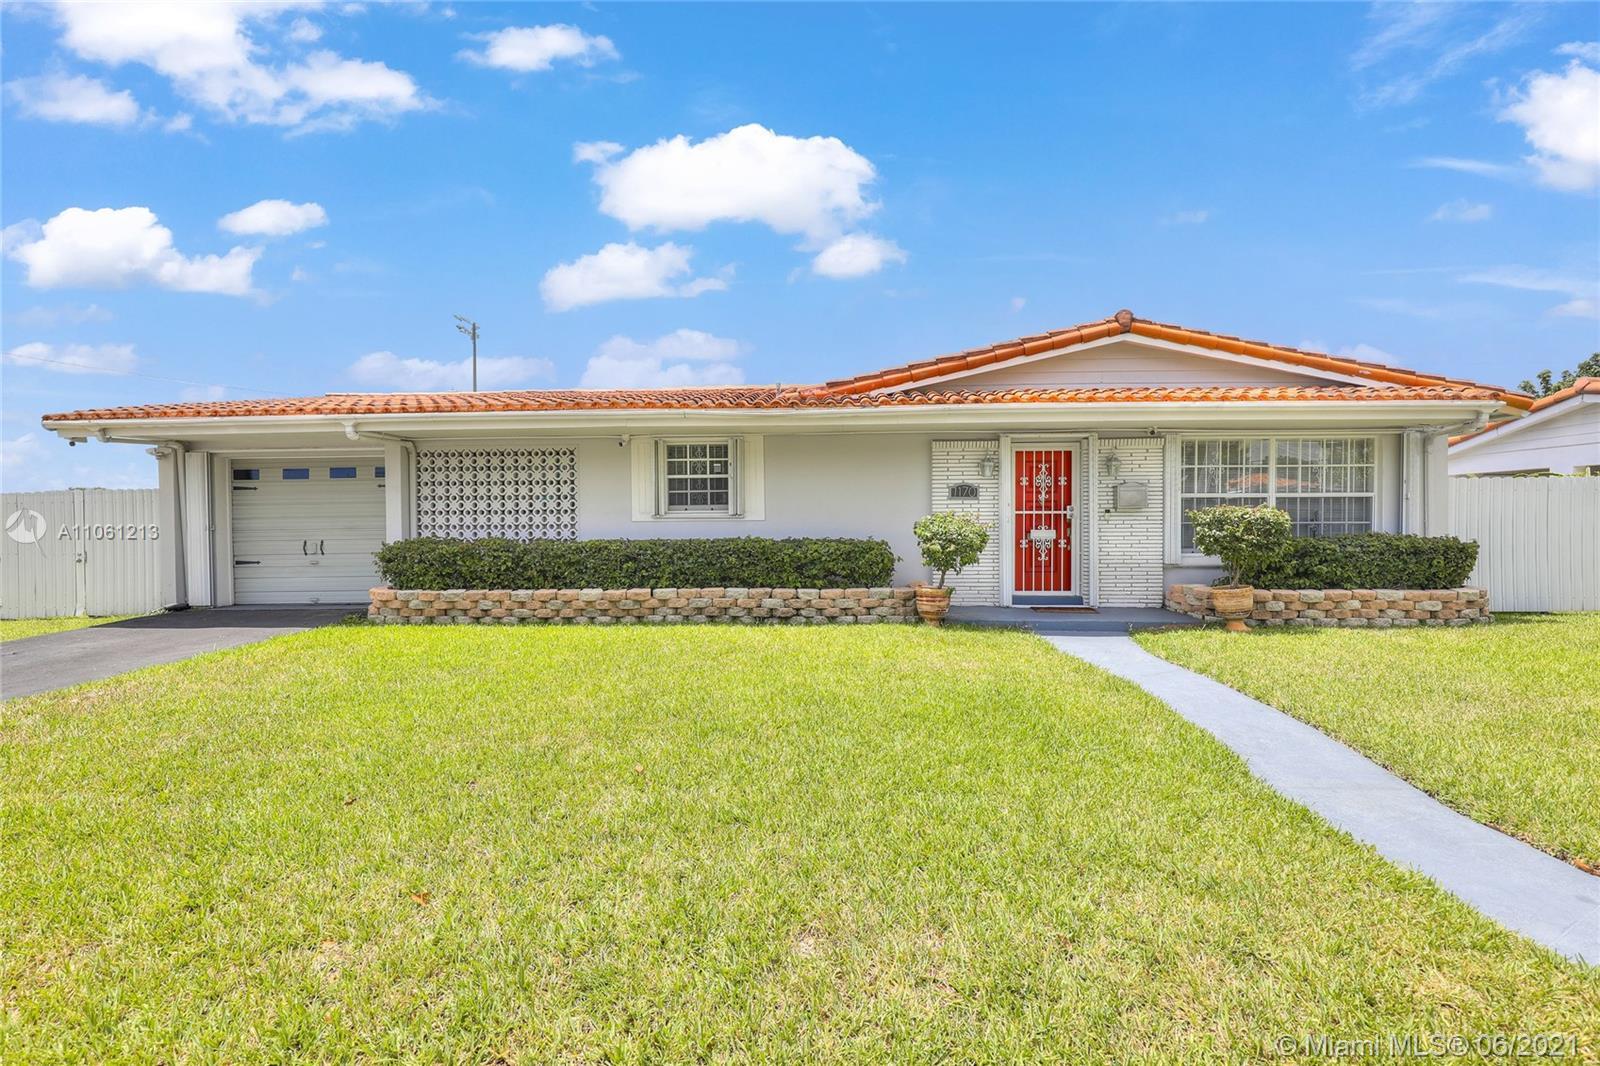 Windward - 1170 NE 171st St, Miami, FL 33162